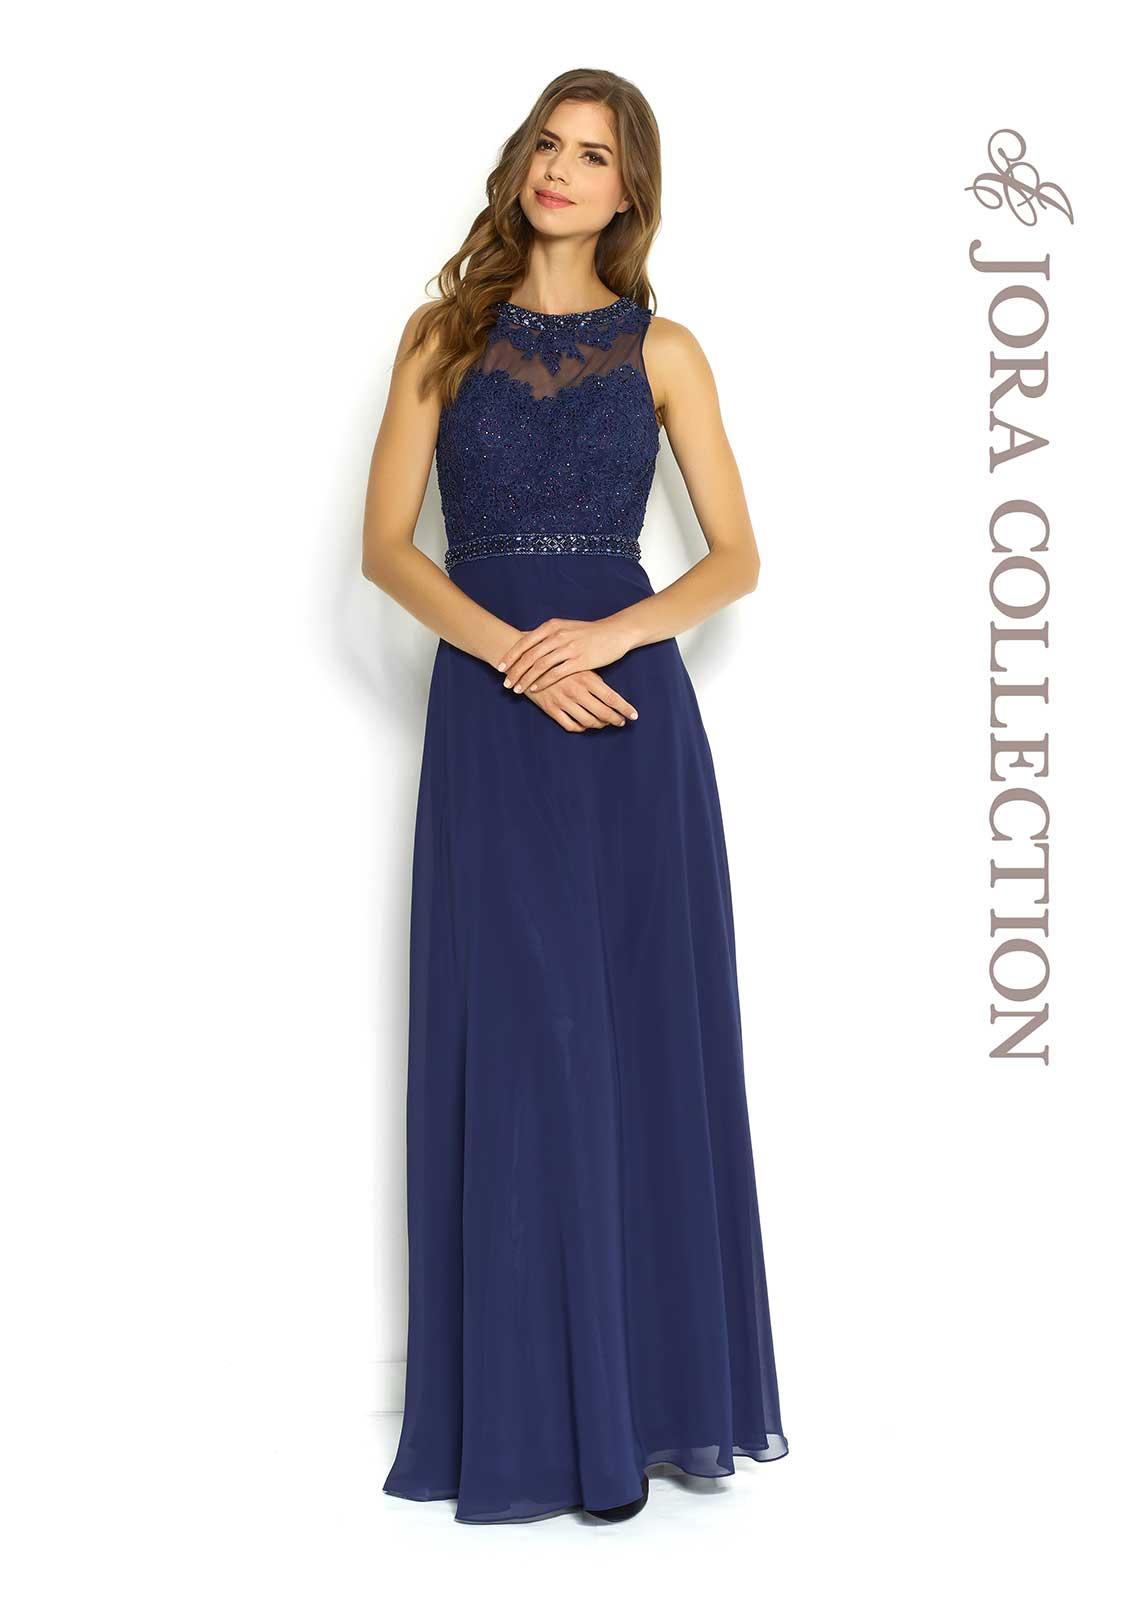 Long formal prom dress